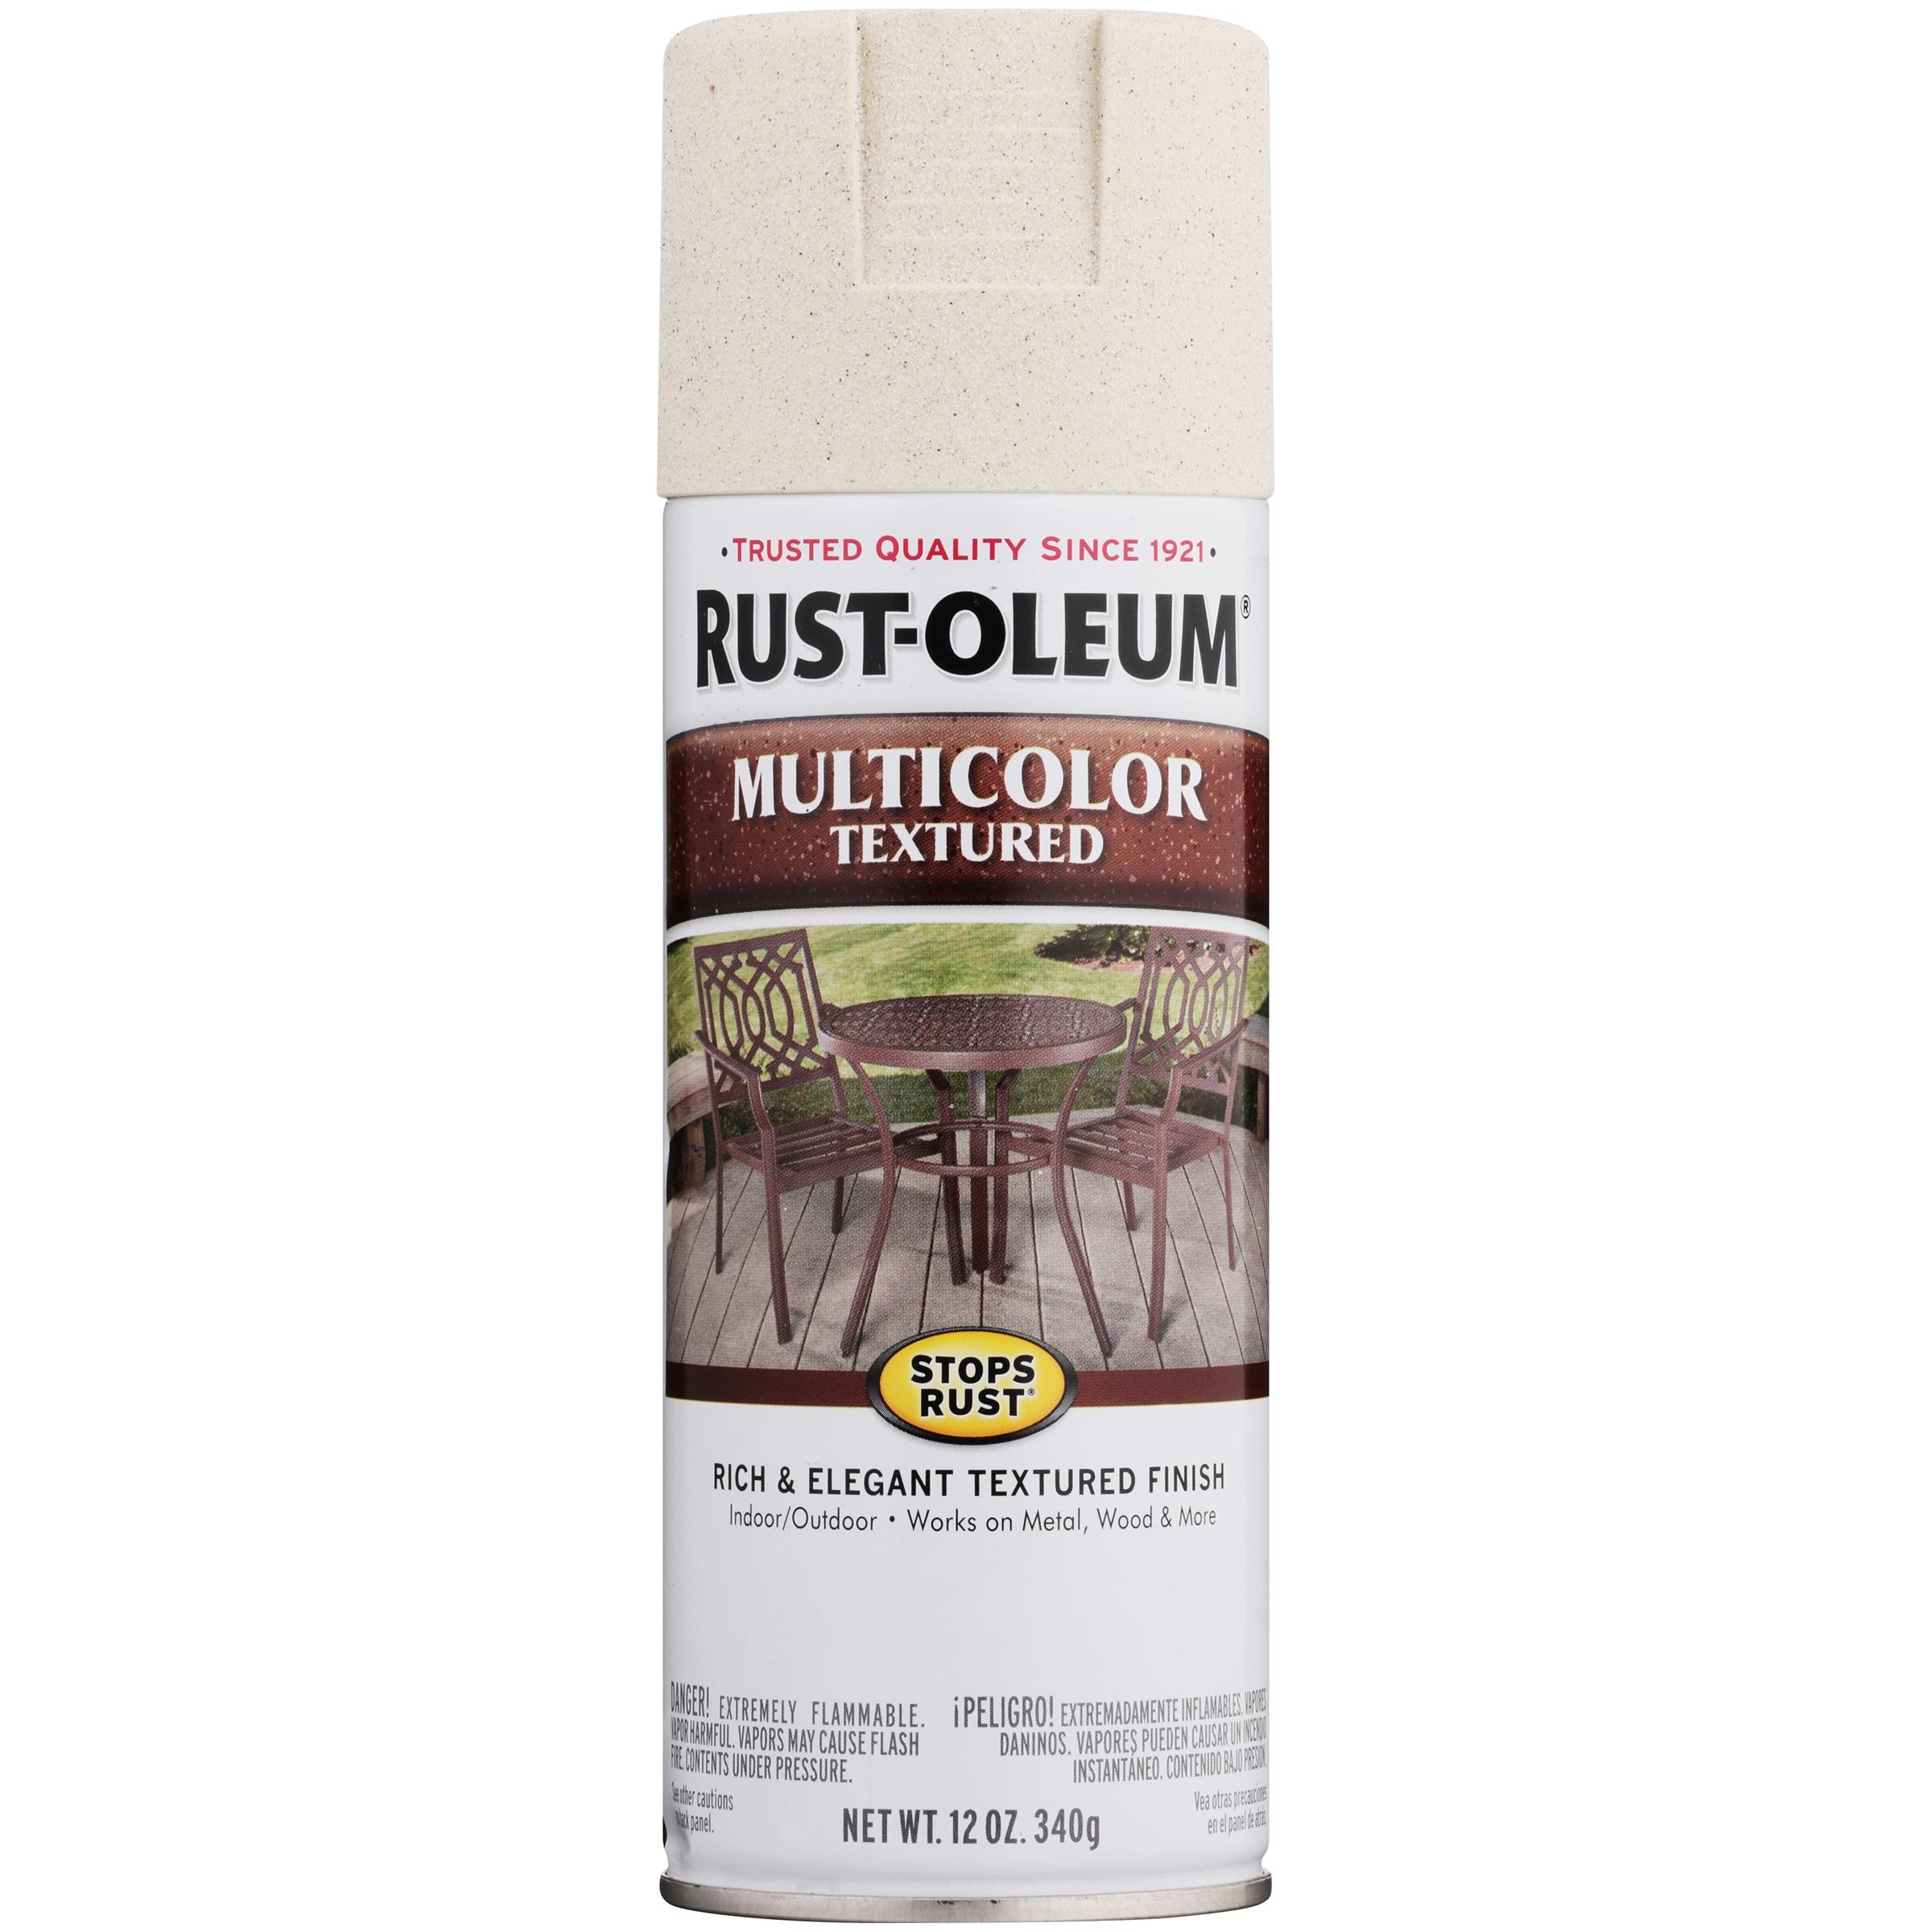 Rust Oleum Stops Rust Multicolor Textured Spray Paint 12 oz